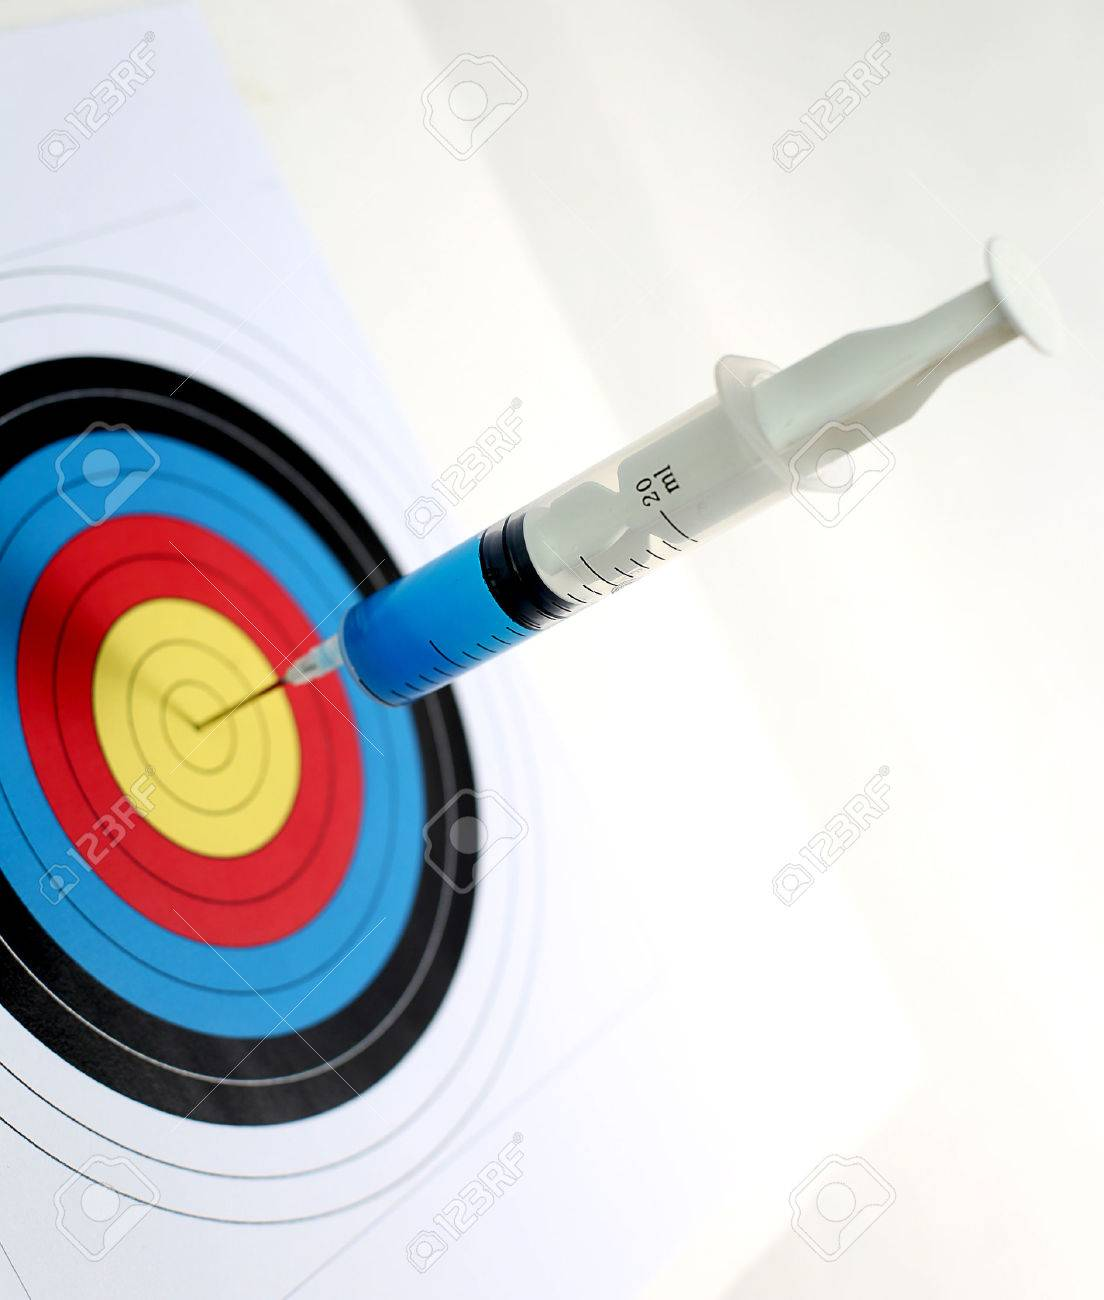 Precision medical syringes hit the bull's eye - 51164998